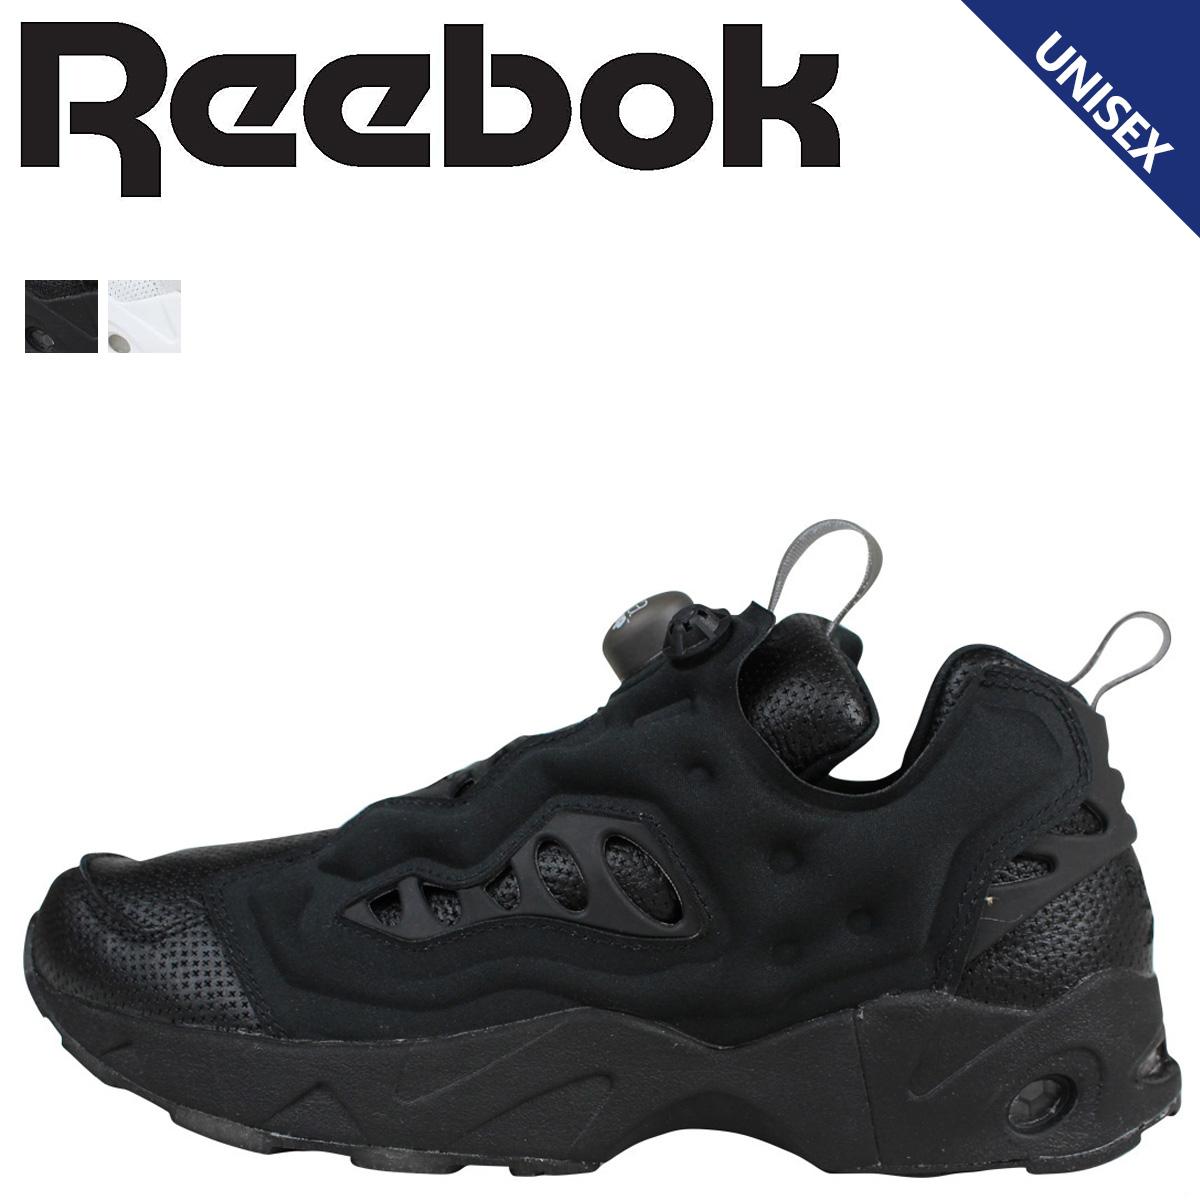 e72d5c2921c Reebok Reebok INSTA PUMP FURY TECH sneakers insta pump fury TEC Kevlar mens  women s 20th anniversary M47611 black x steel unisex 20th ANNIVERSARY  1    21 ...